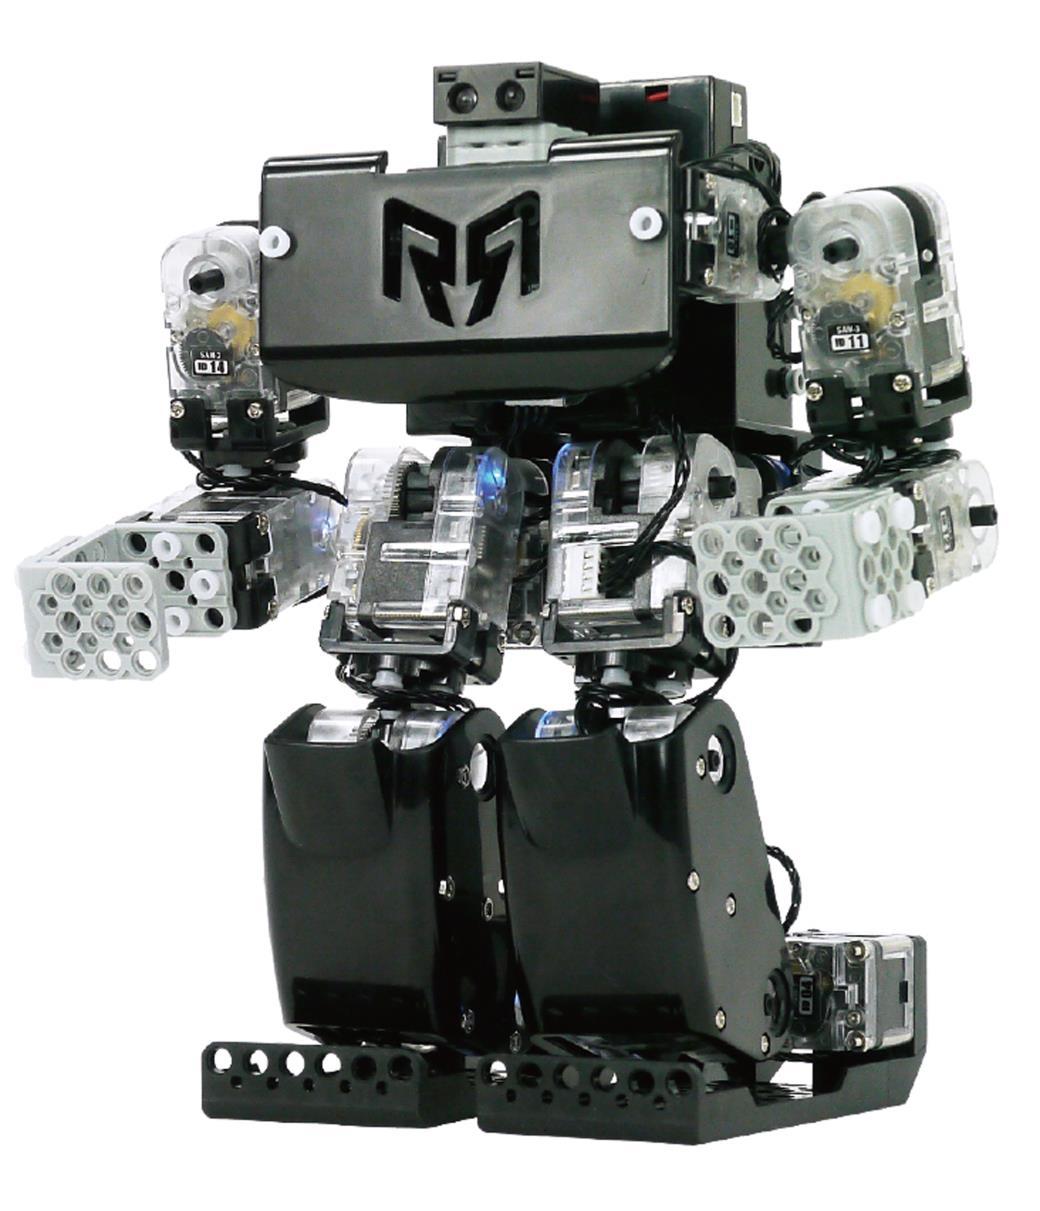 HIGH-END HUMANOID ROBOT KIT(ASSEMBLY KIT)) - Eduscience  |Humanoid Robot Assembly